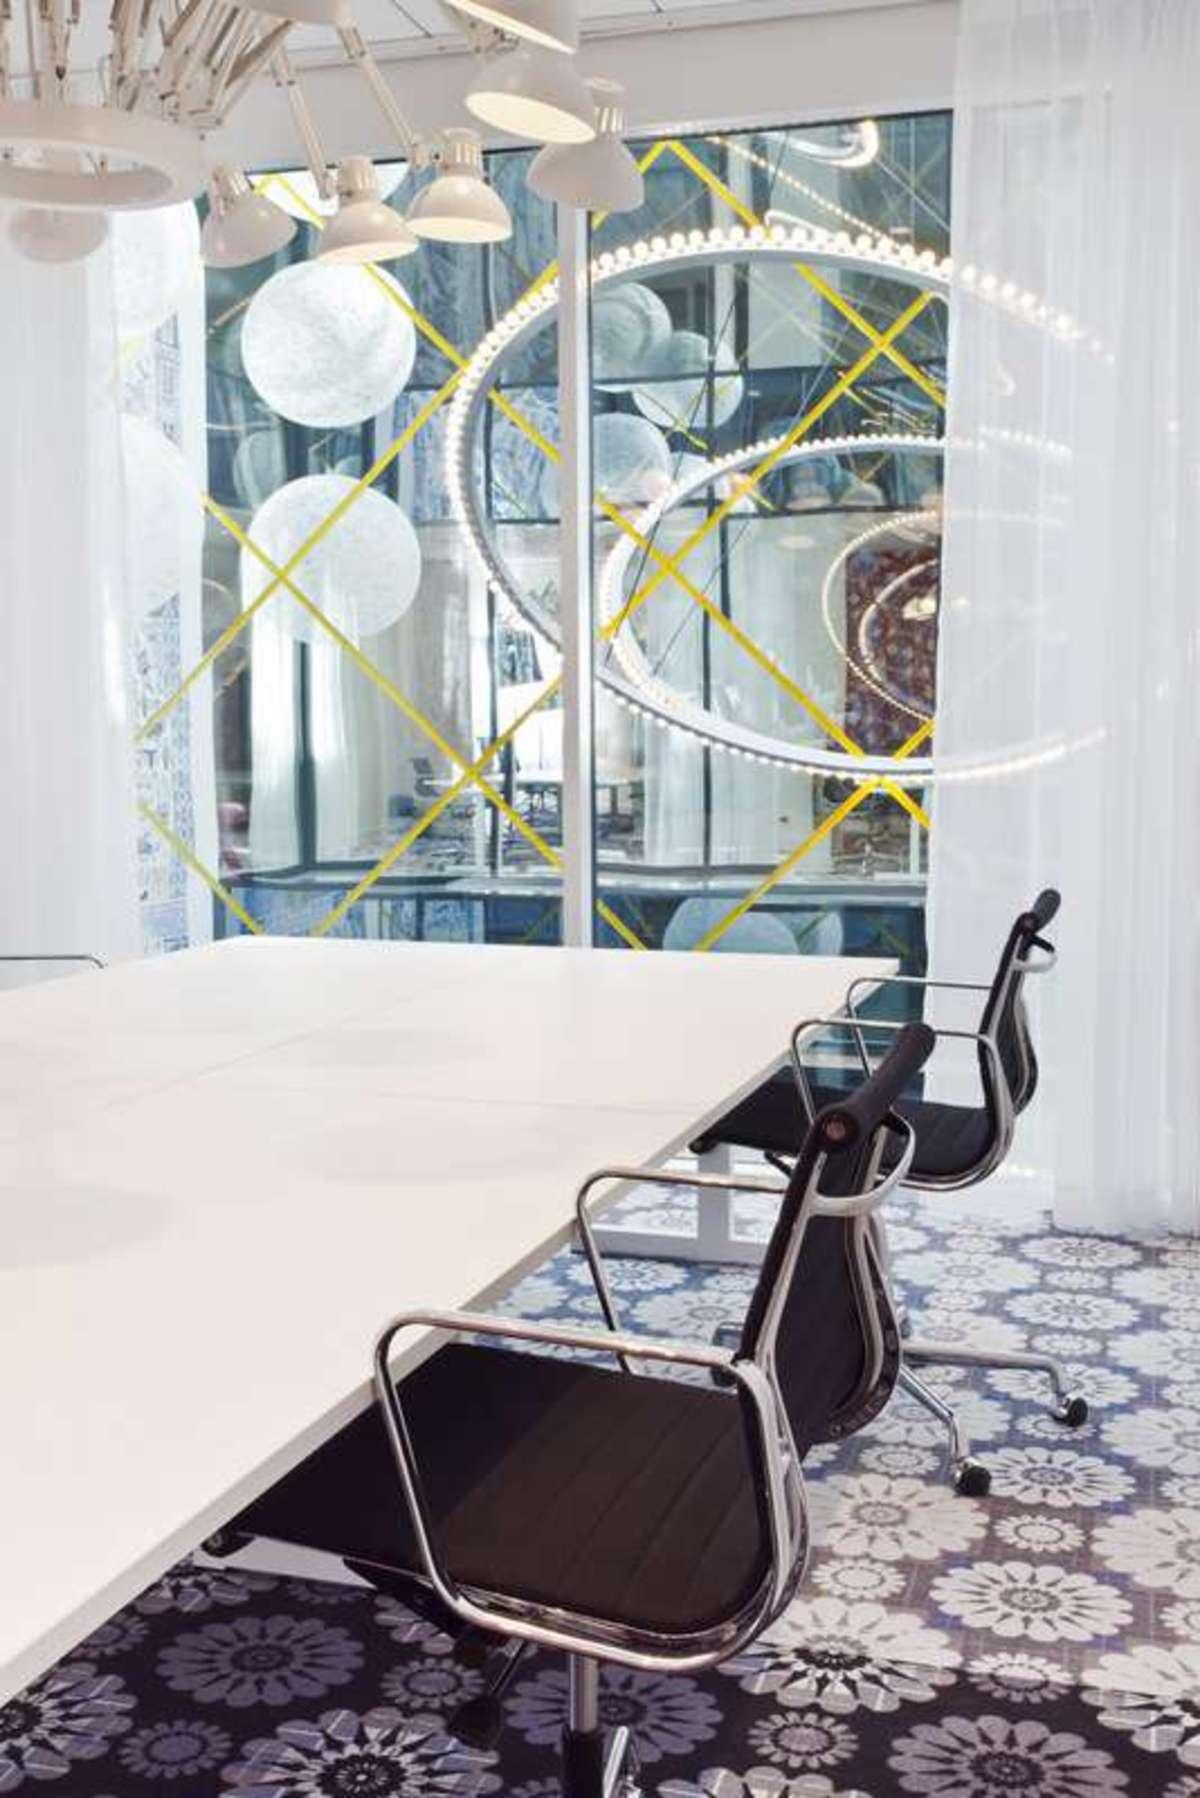 Marcel wanders andaz amsterdam prinsengracht interior for Interieur design amsterdam